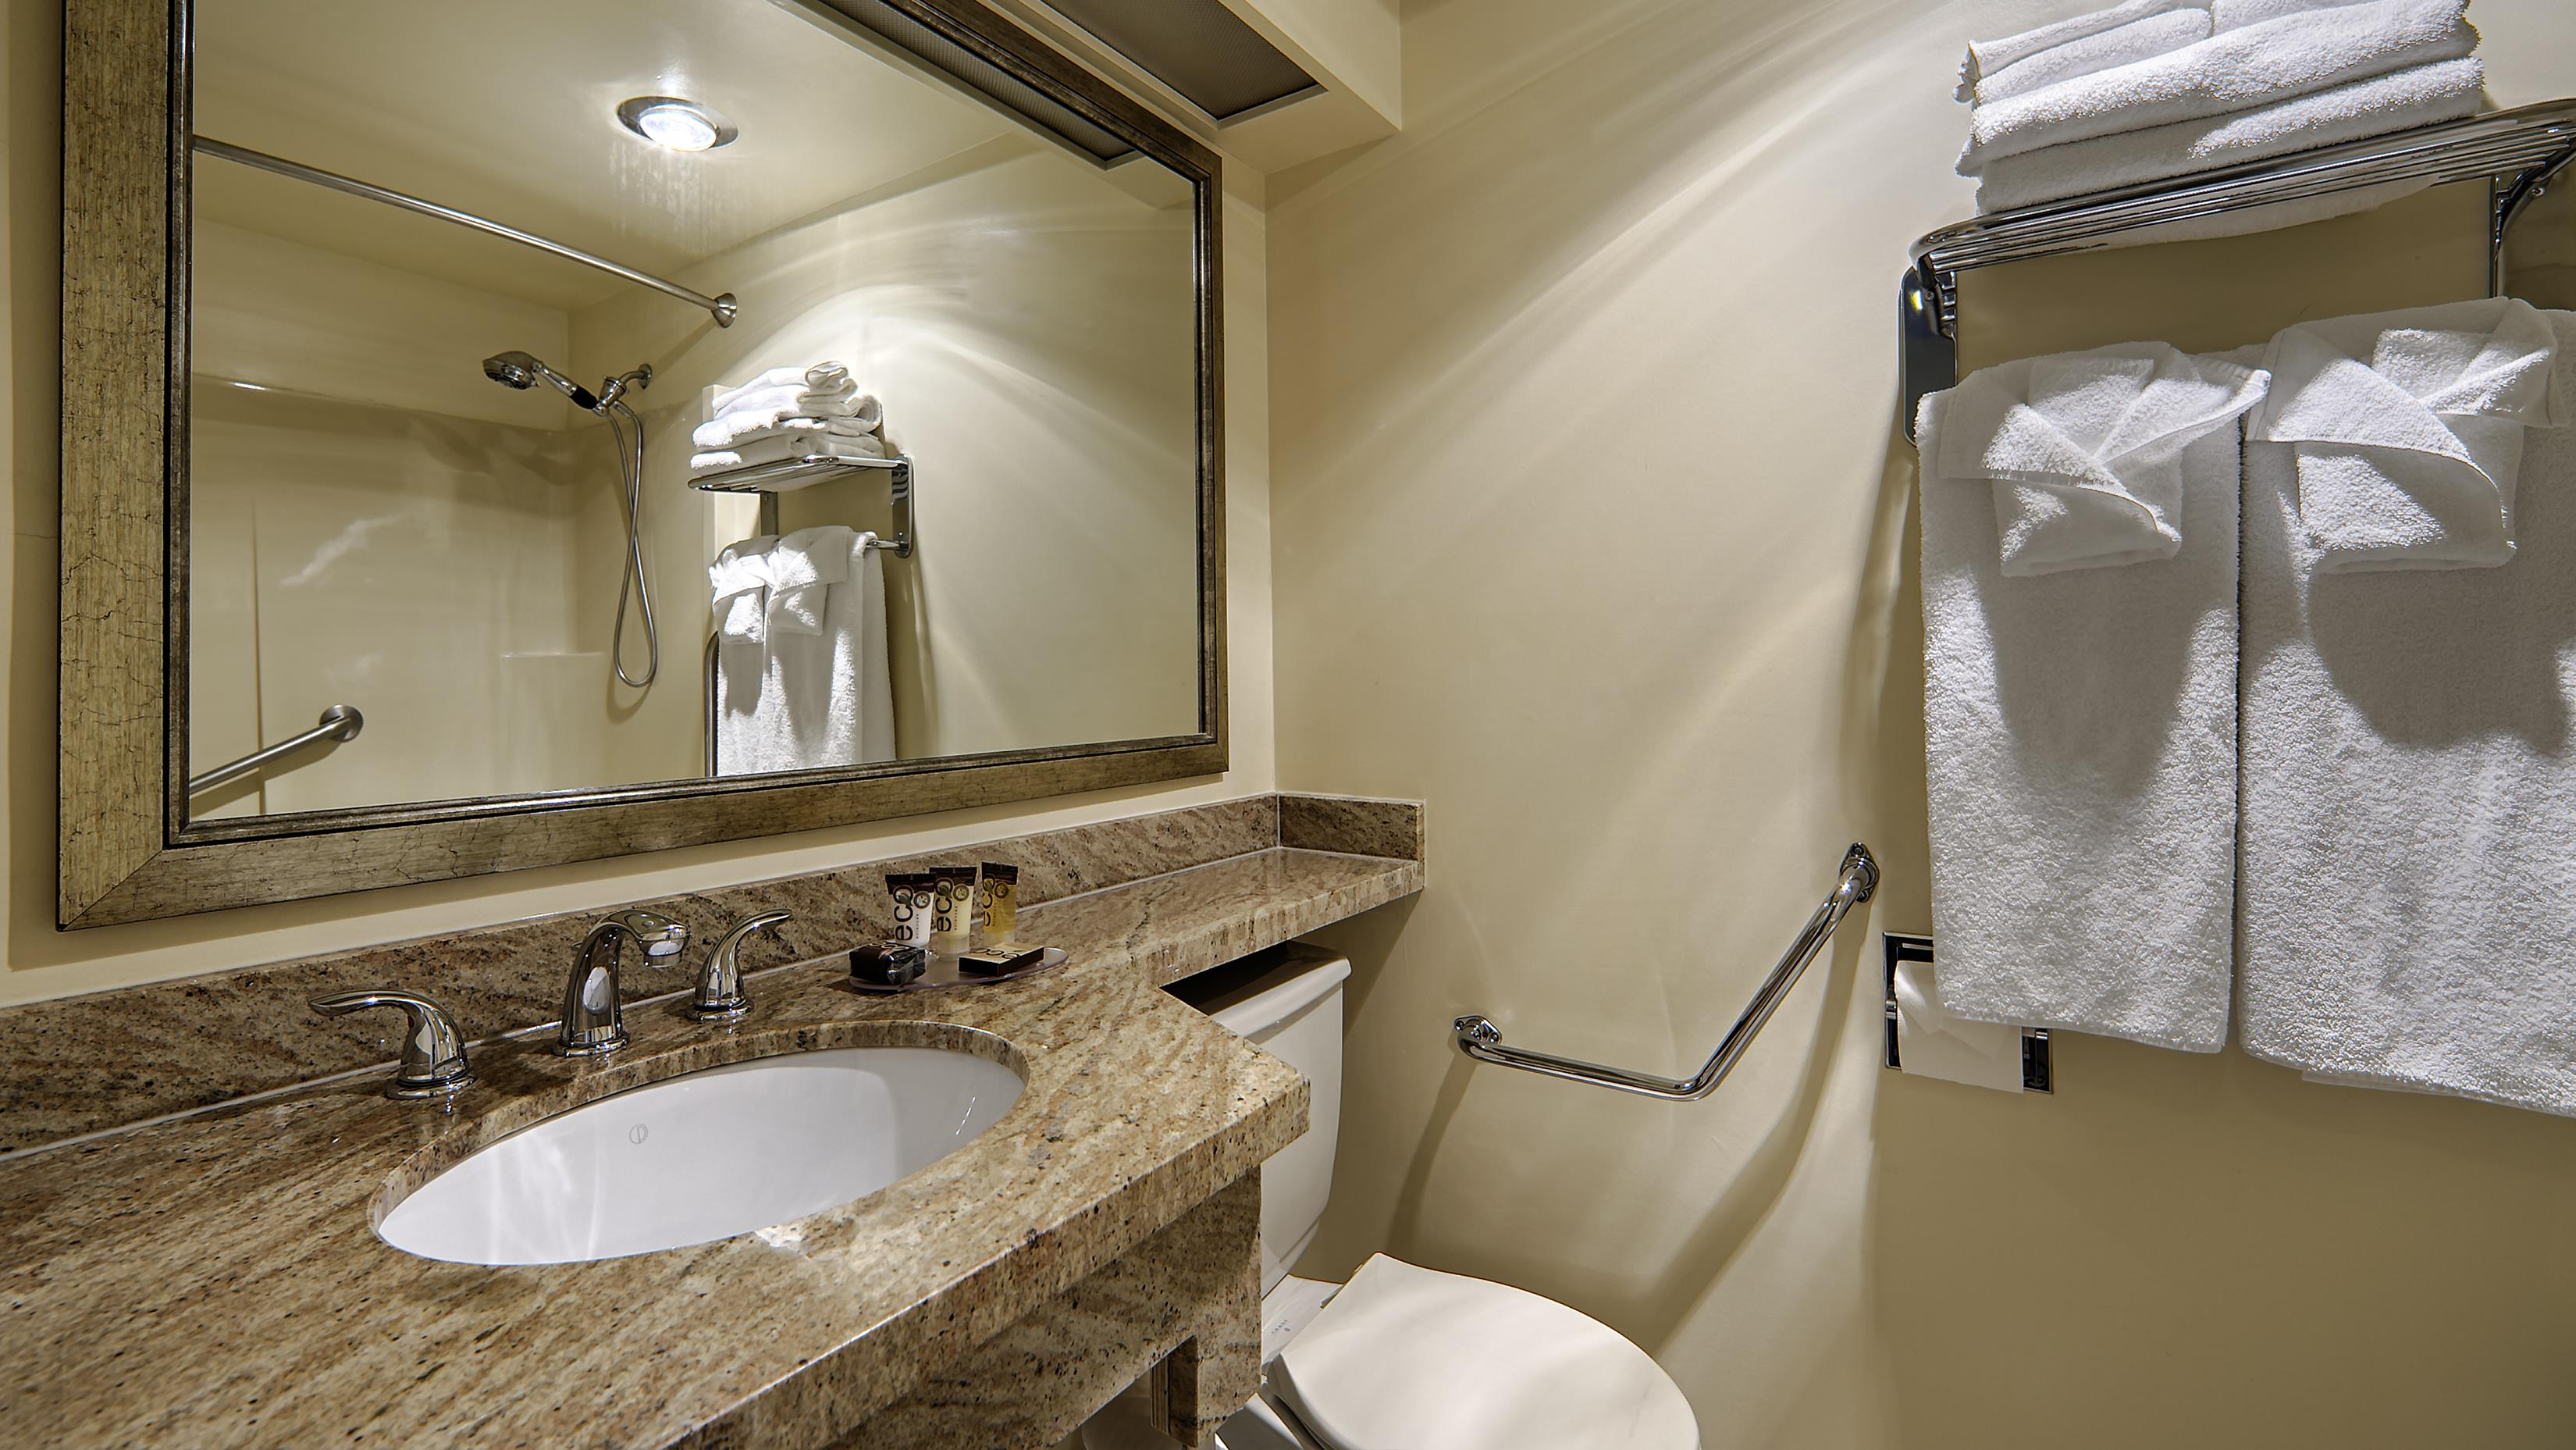 Best Western Cowichan Valley Inn in Duncan: Guest Bathroom